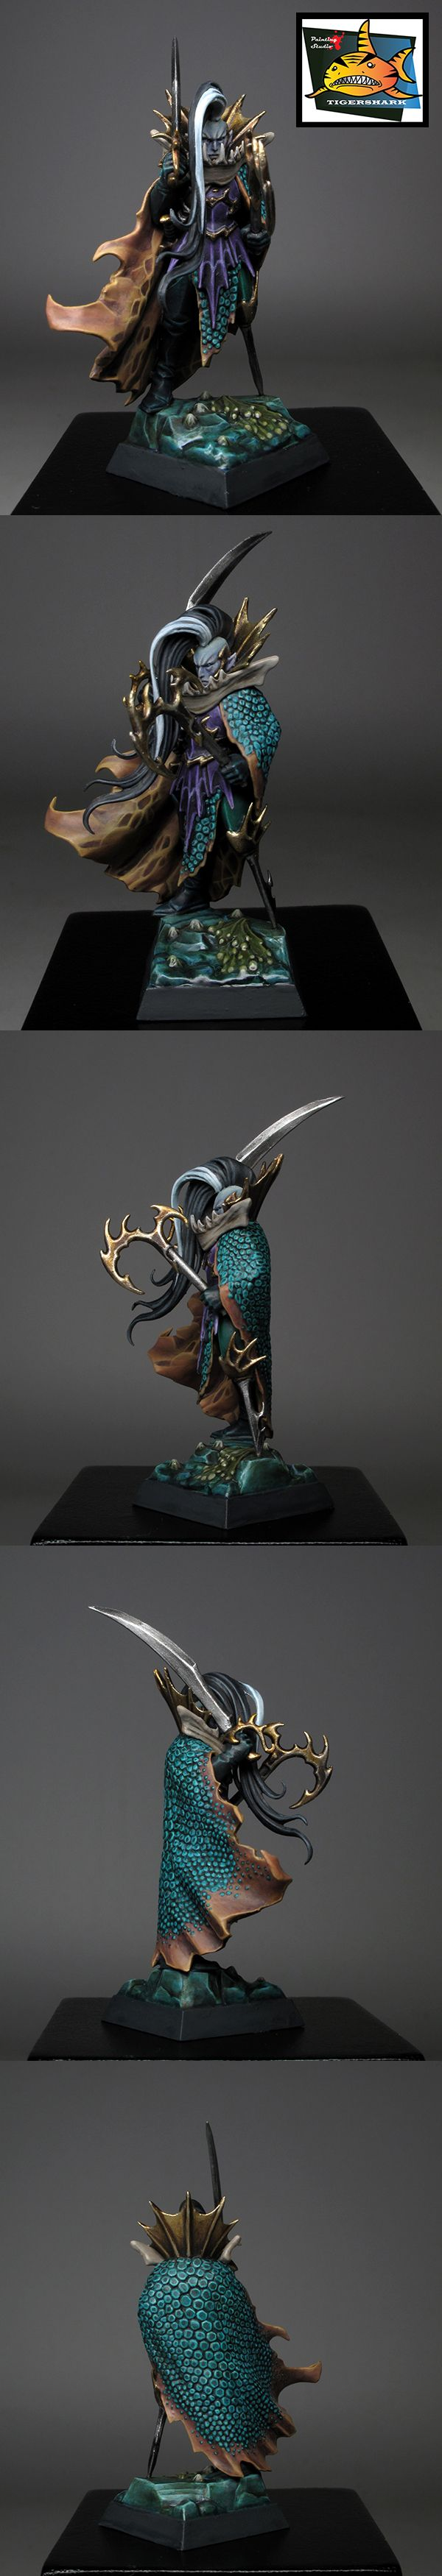 Dark Elves Fleetmaster - Tigershark Infinite